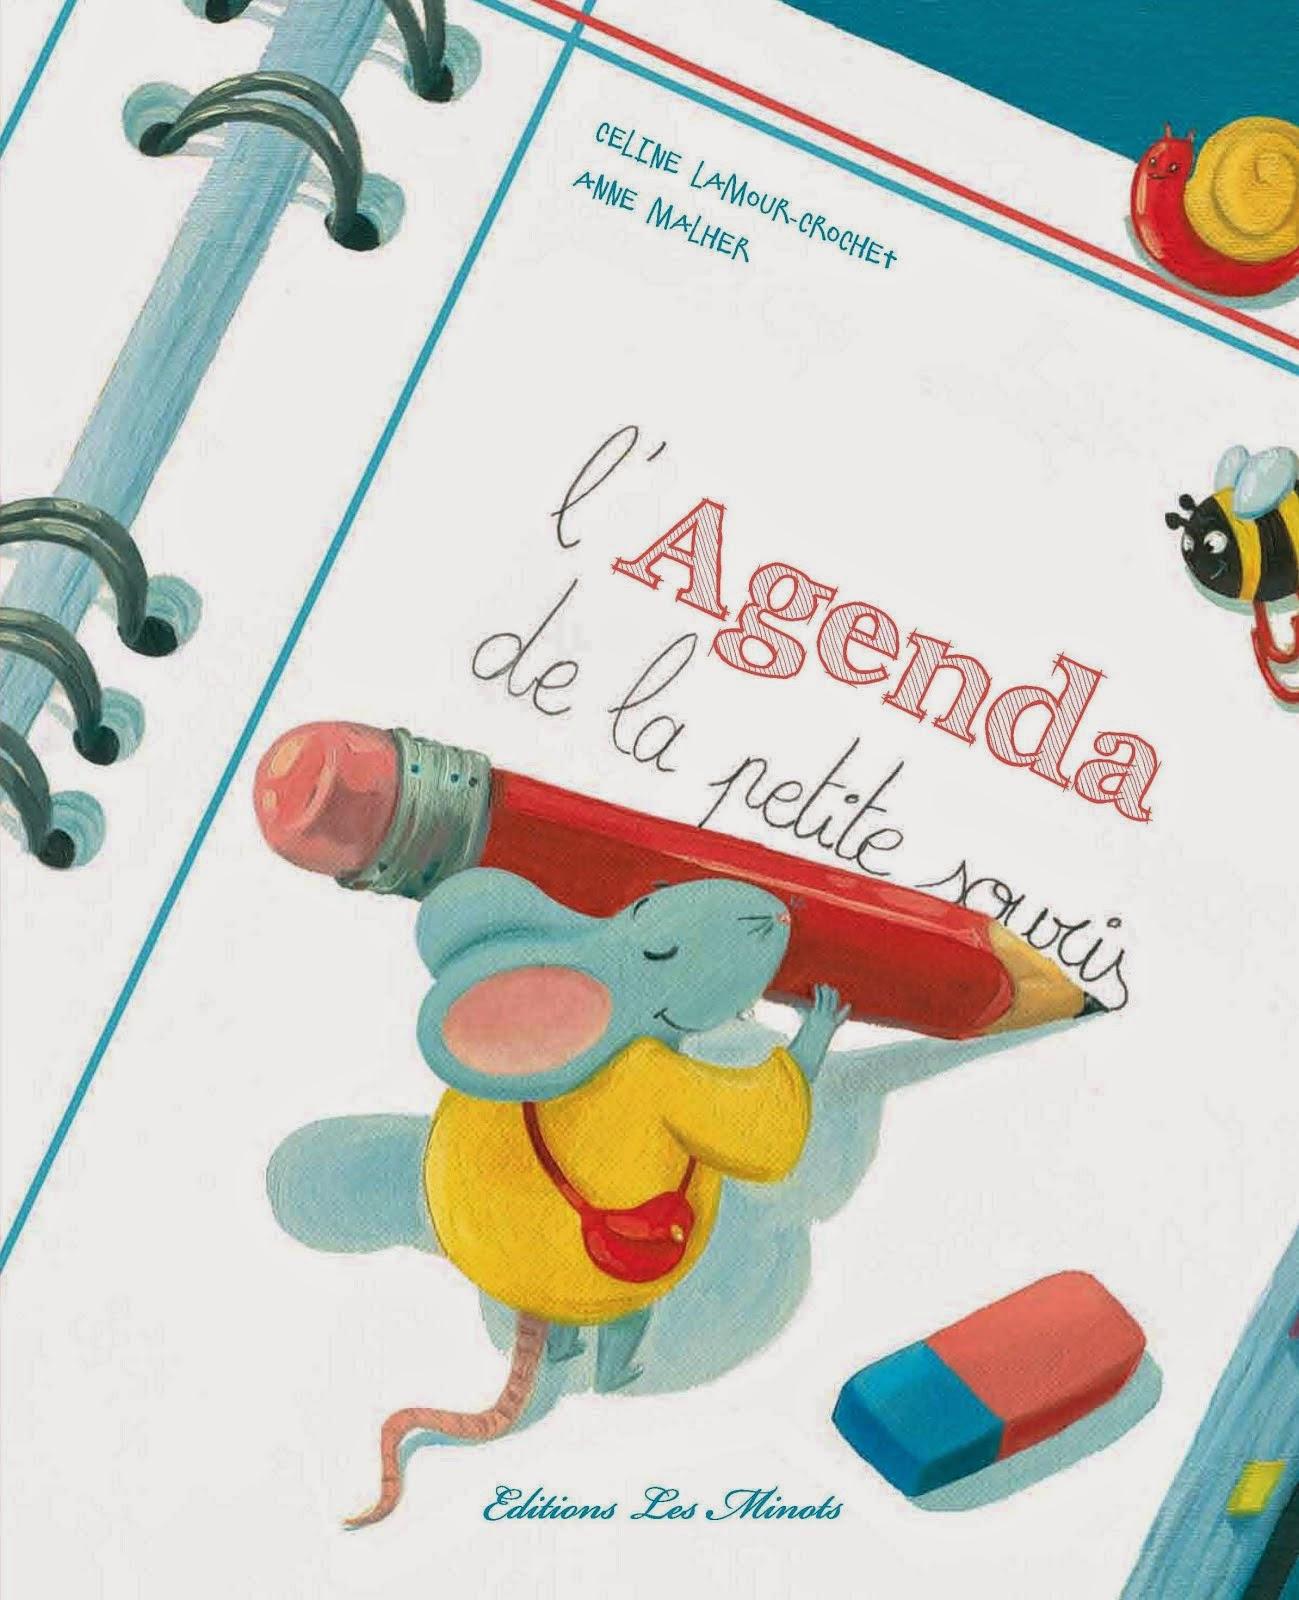 L'agenda de la petite souris